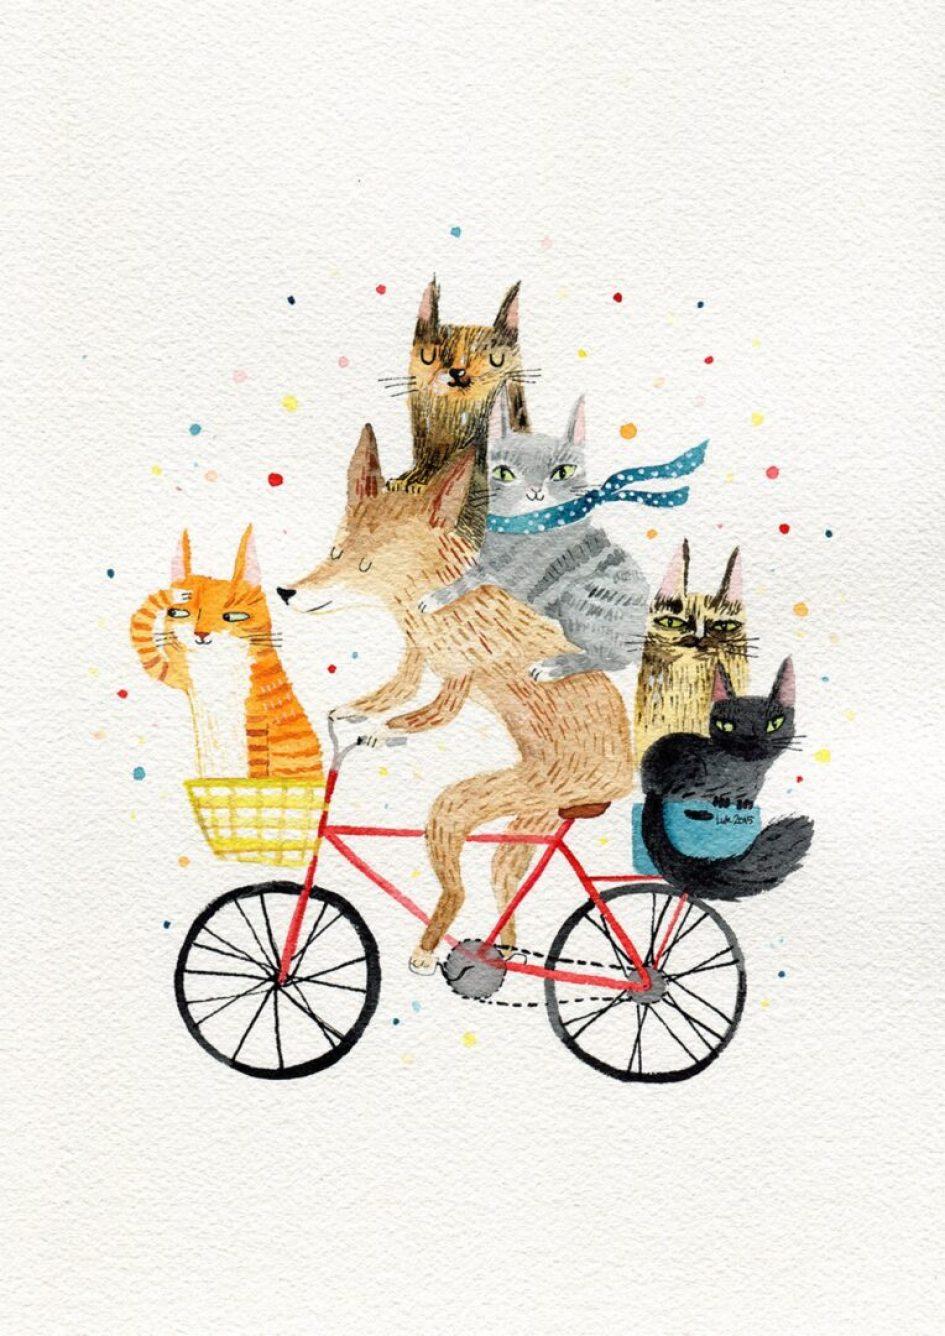 dierendag animal illustration